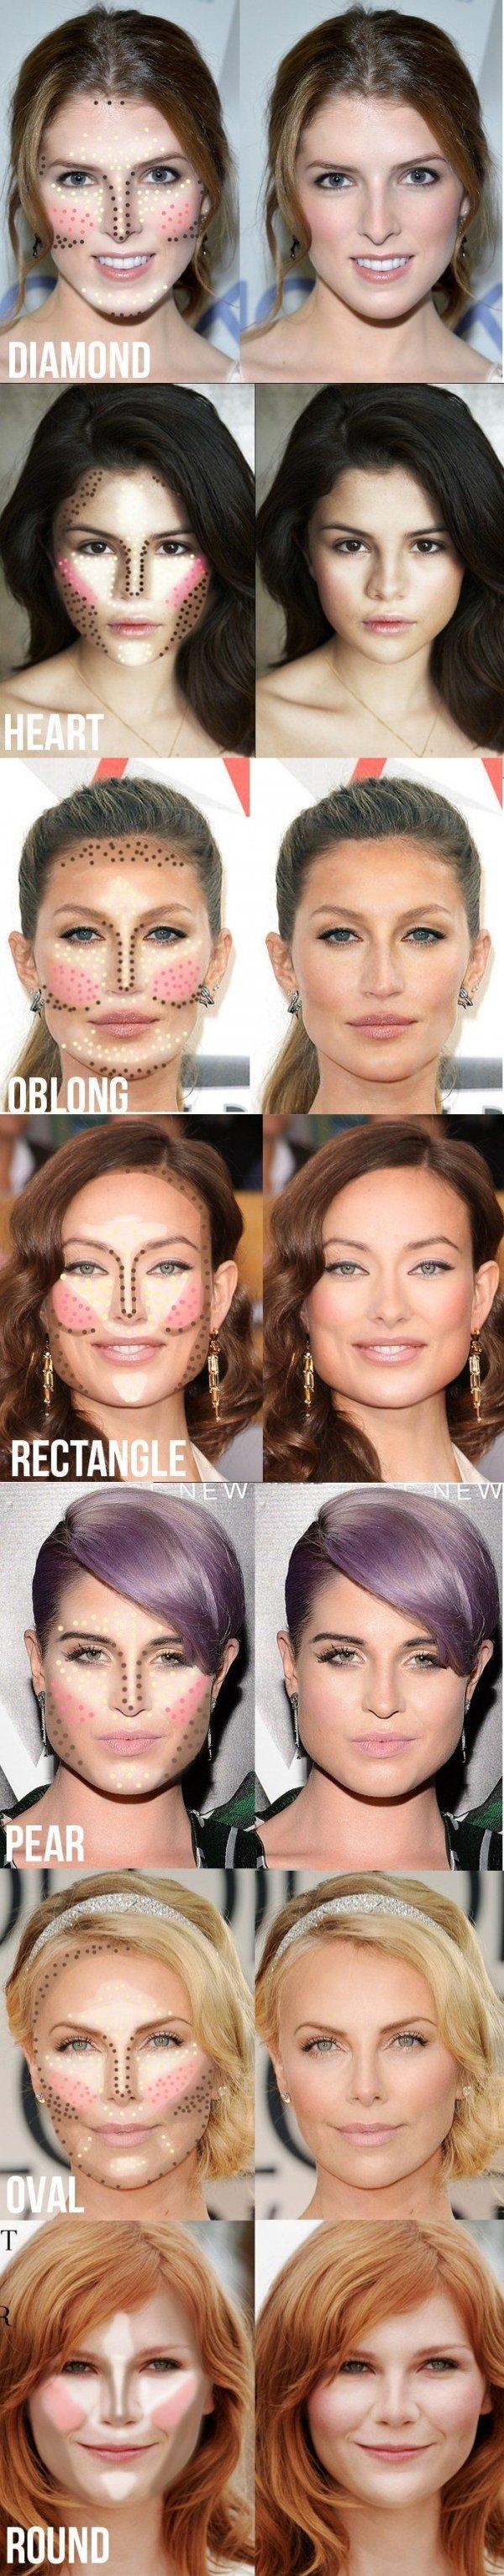 face,skin,head,lip,sense,